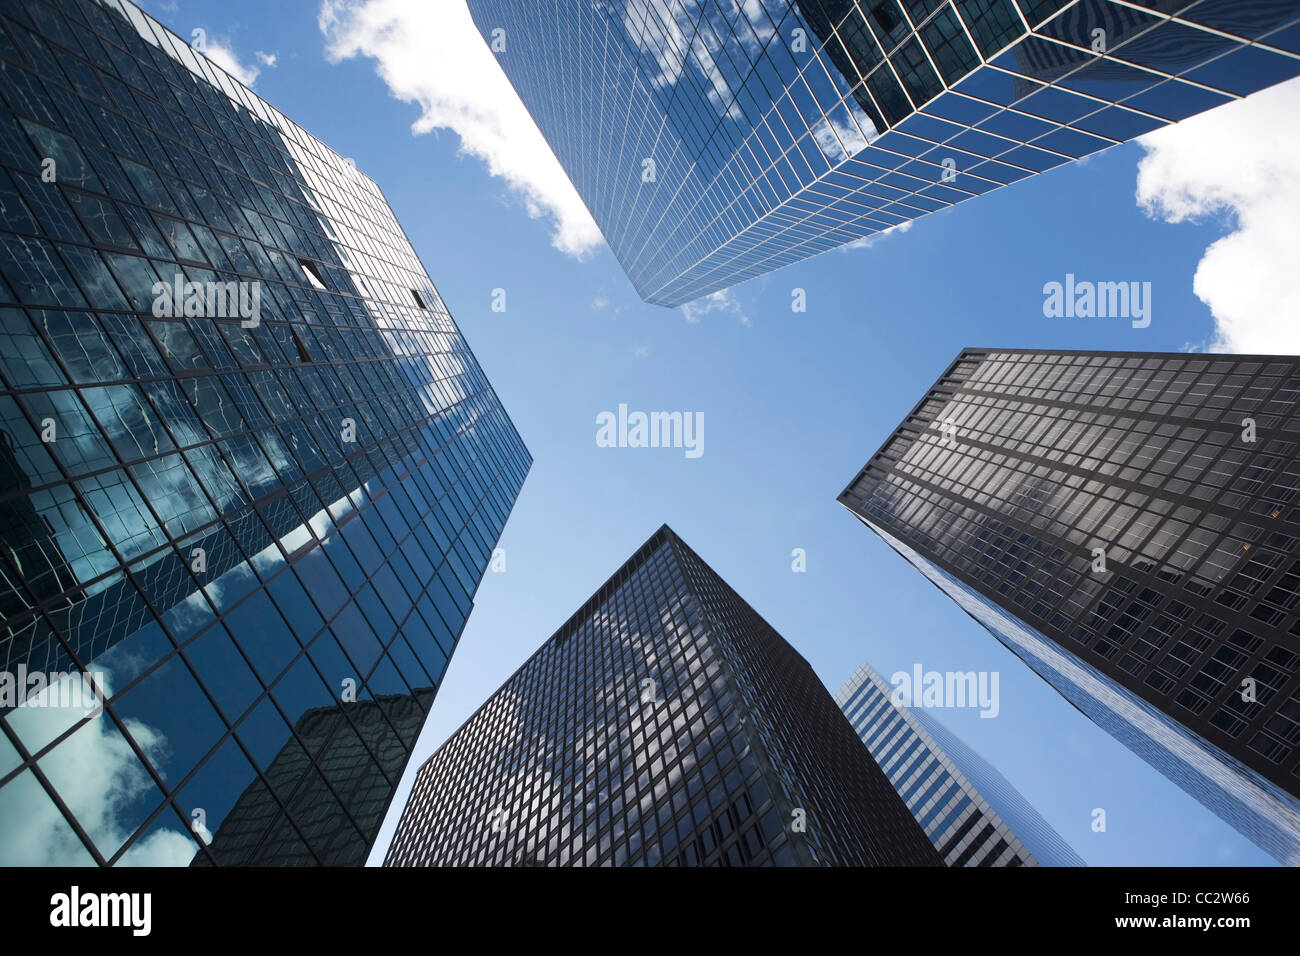 USA, New York State, New York City, Modern office buildings - Stock Image